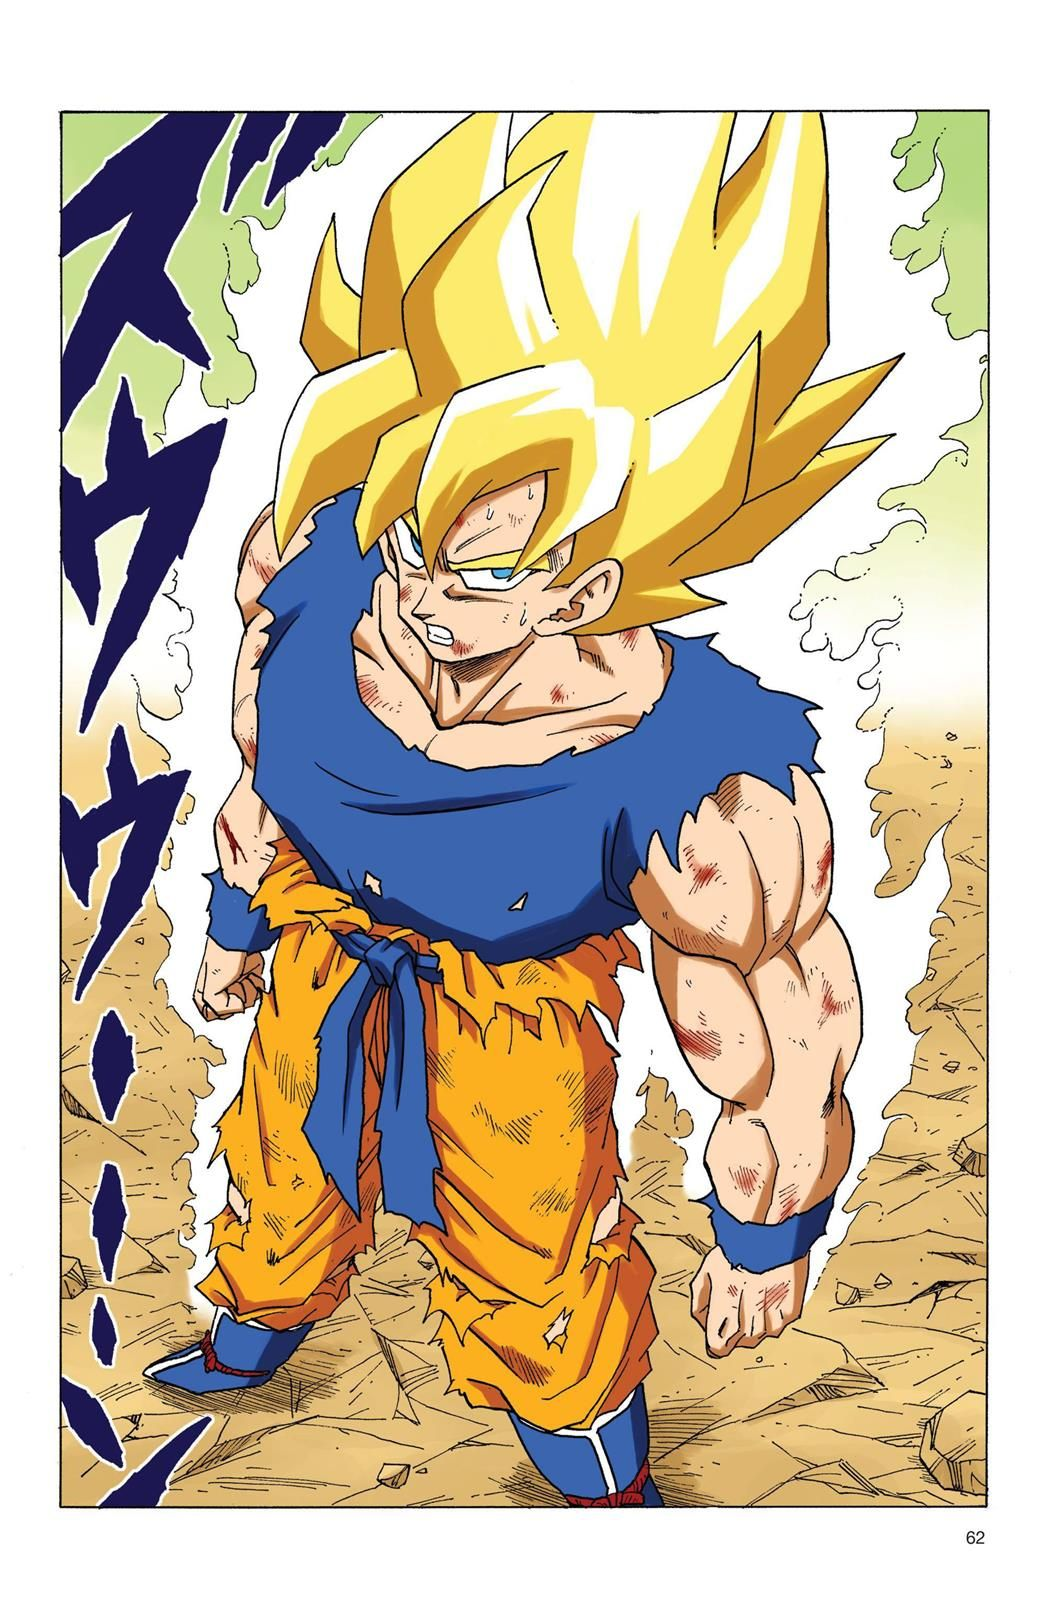 Read Dragon Ball Full Color Freeza Arc Chapter 70 Page 10 Online For Free Dragon Ball Artwork Dragon Ball Super Manga Dragon Ball Wallpapers